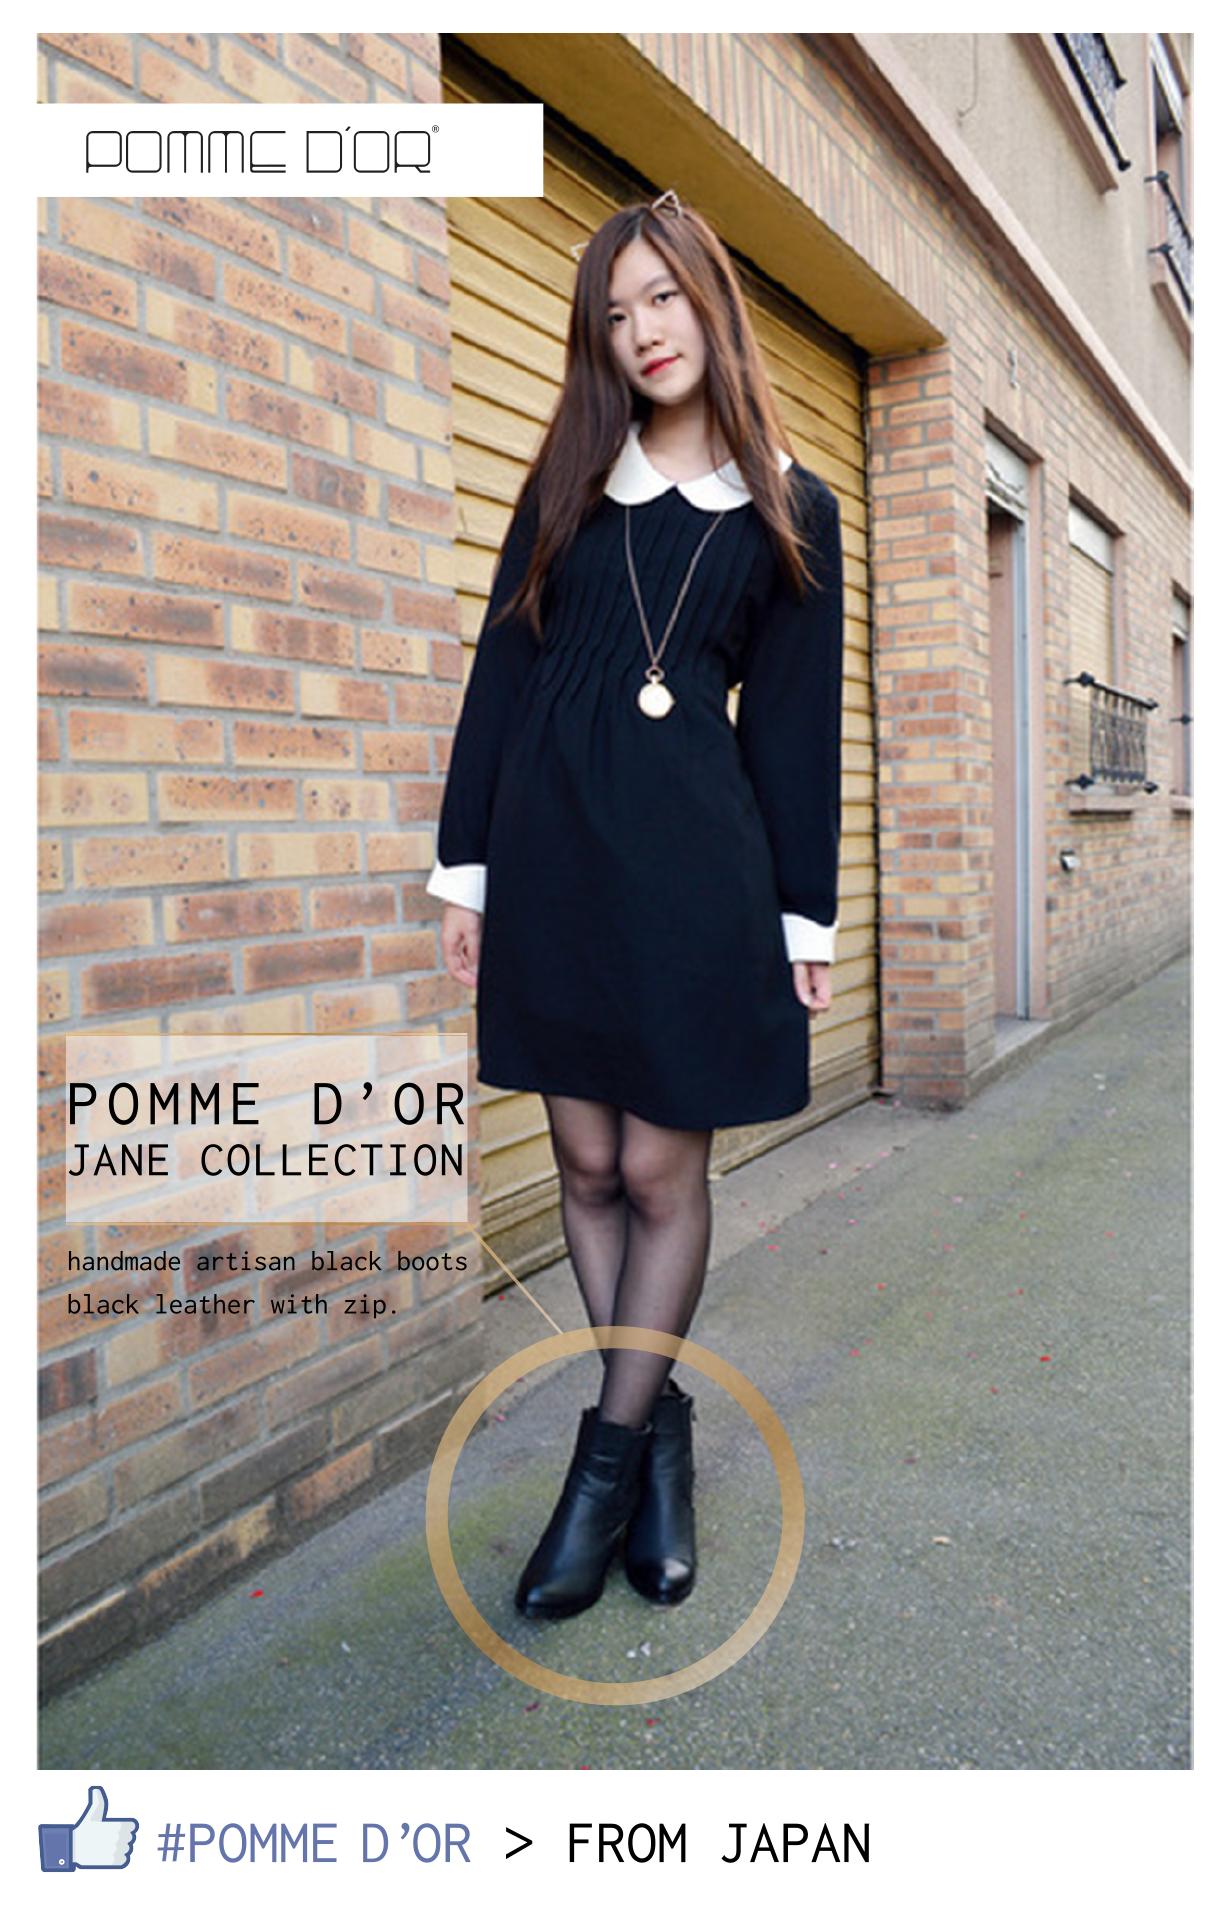 Pomme d'or - Black boots I prodotti Pomme d'or e i  nostri stivali, anche in Giappone. #pommedorjapan